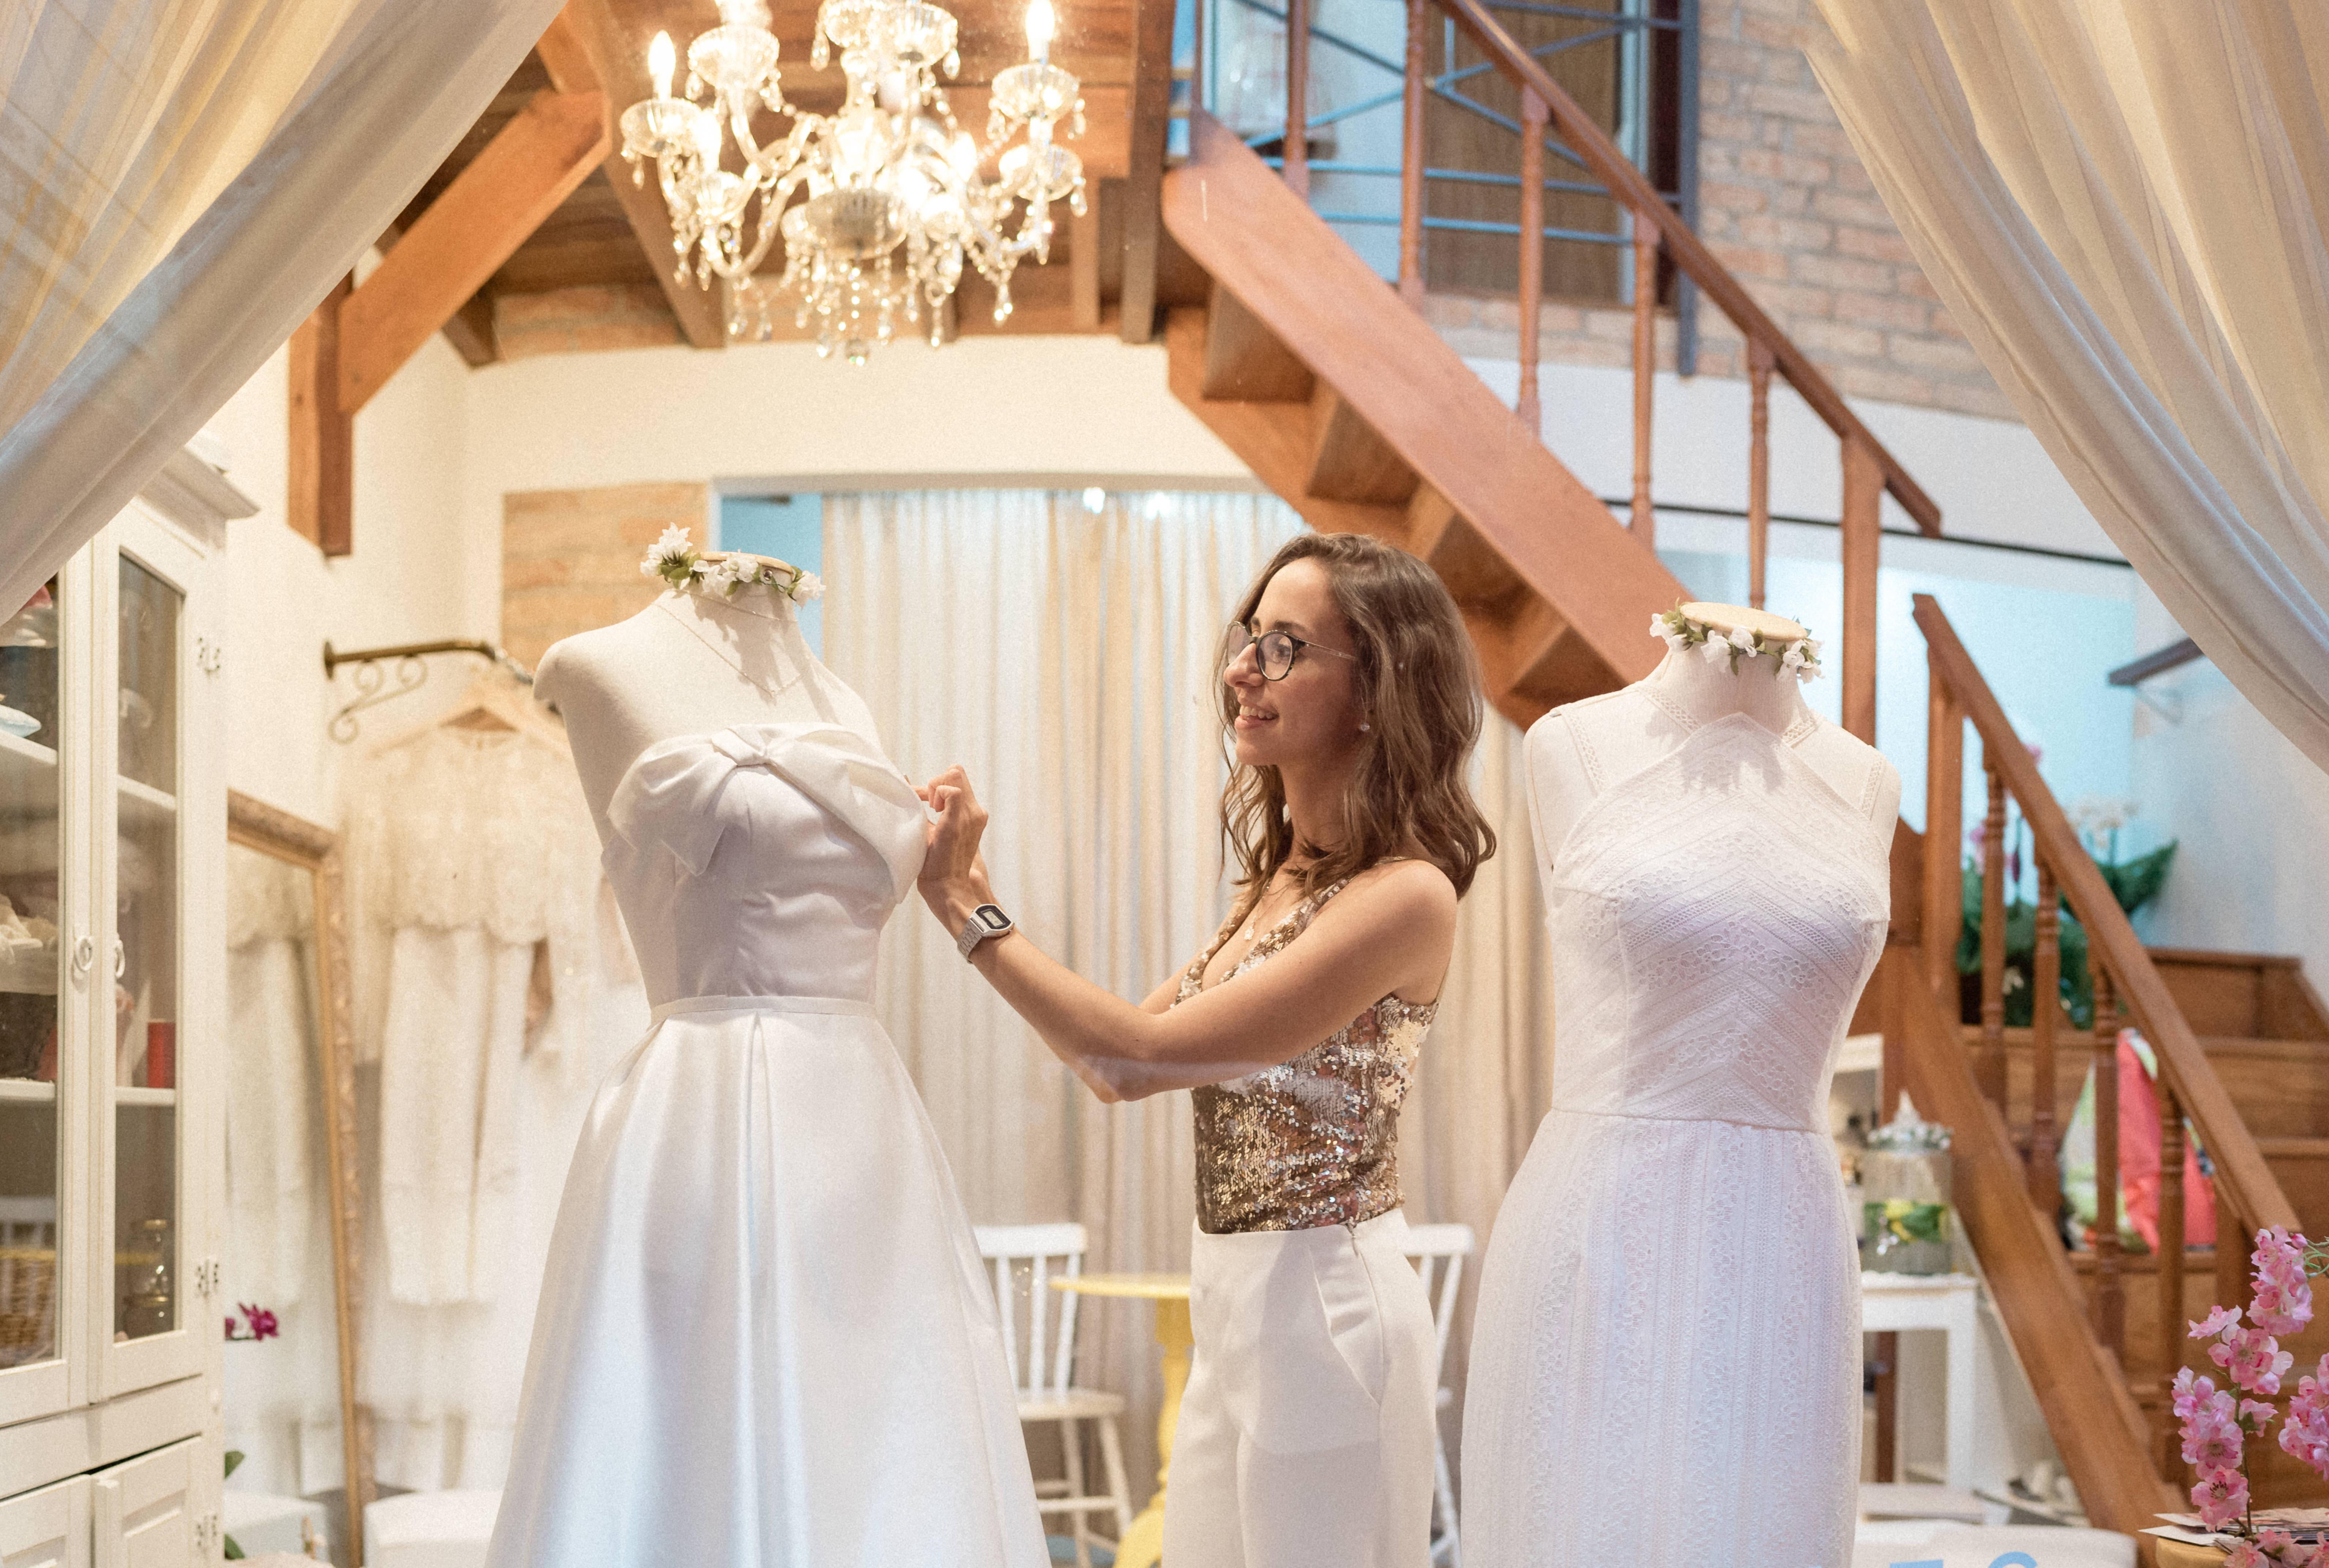 Contate Helen Salles Dressmaker Atelier